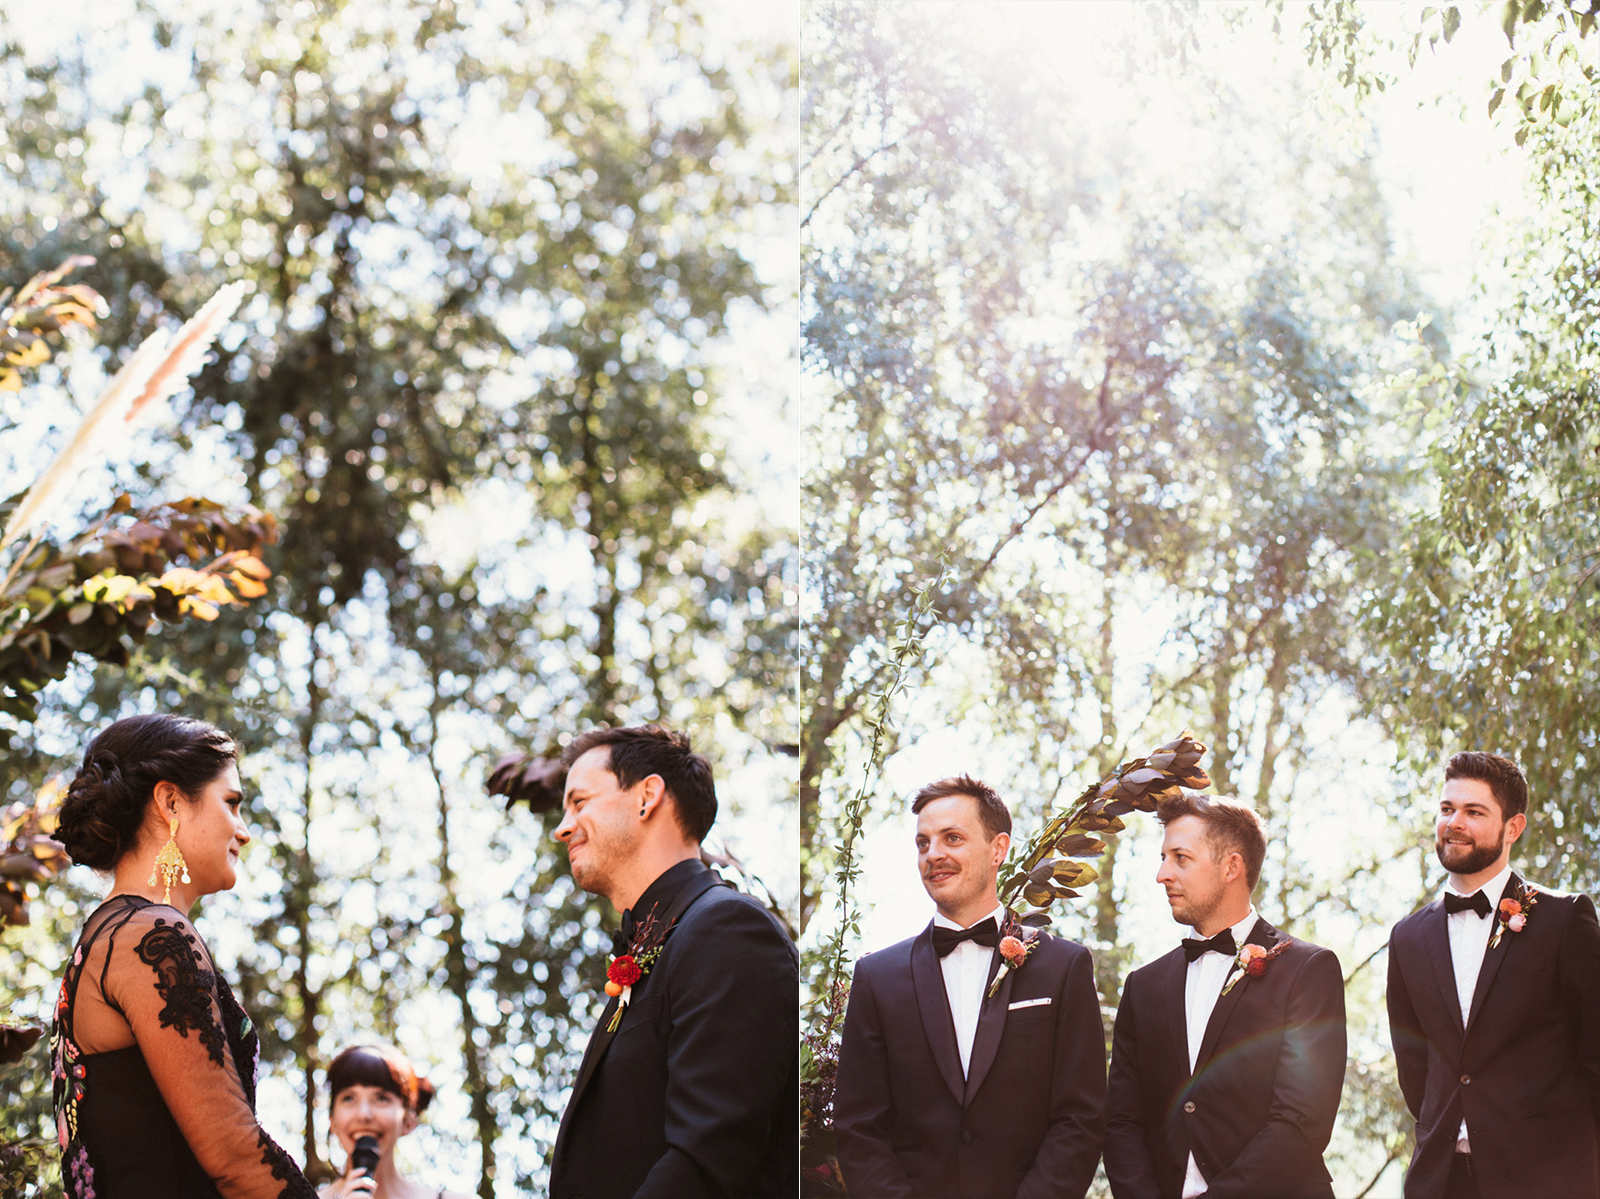 ZD-Melbourne Wedding Photographer-Dean Raphael-44.jpg